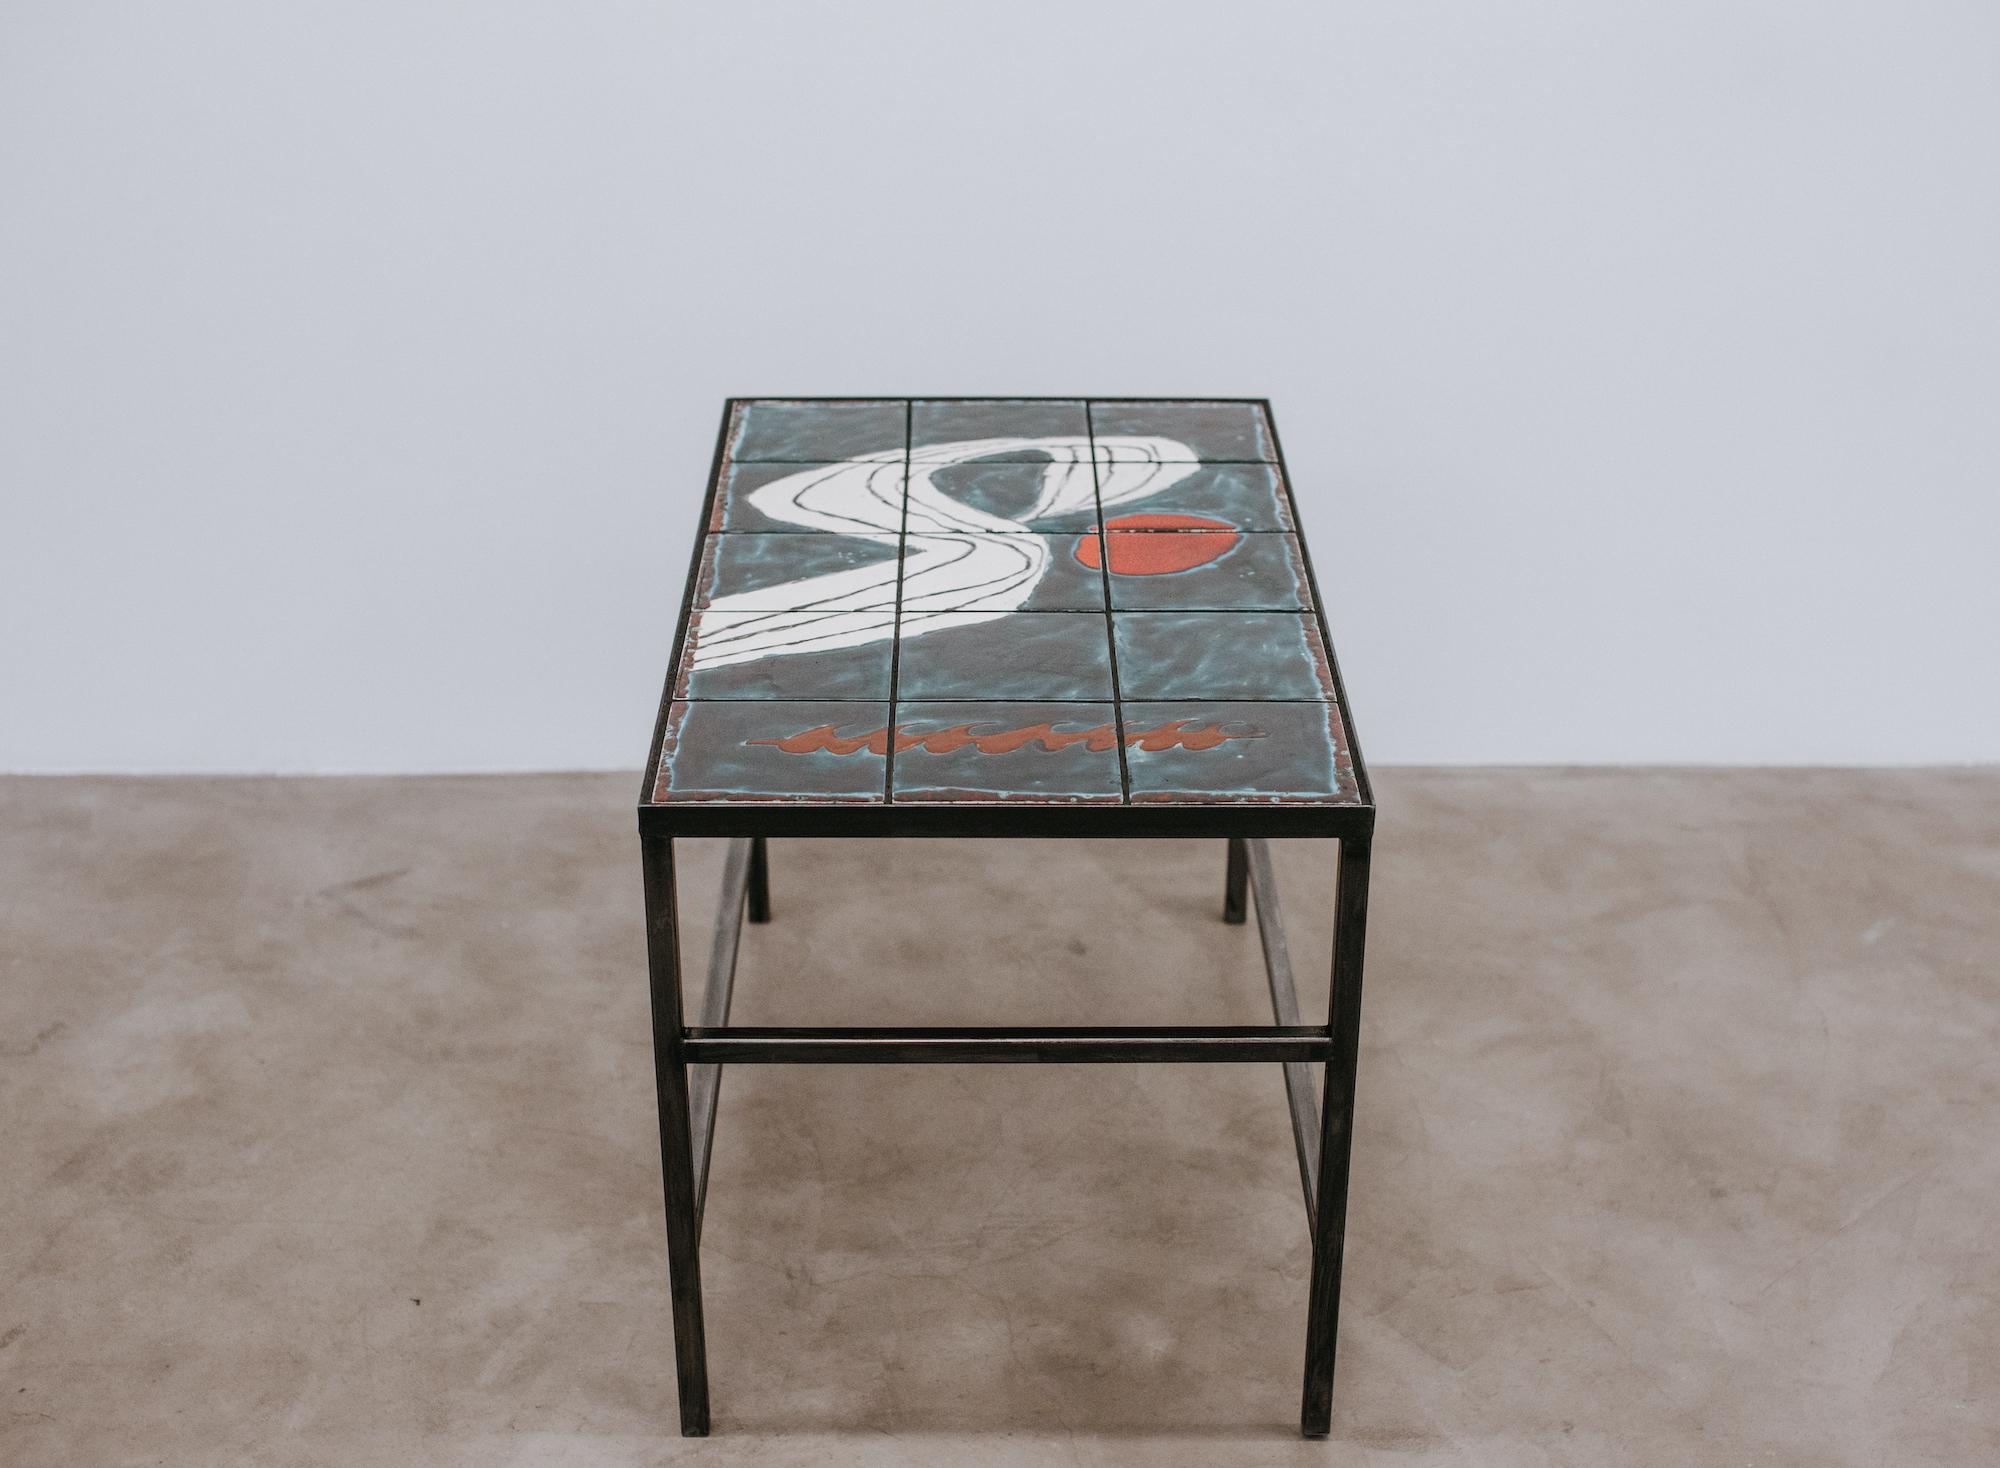 Table #1, Stevie Dix, ceramic, enamel and wrought iron, 48x80x53 cm, 2020 © GALERIE CHLOE SALGADO and Stevie Dix